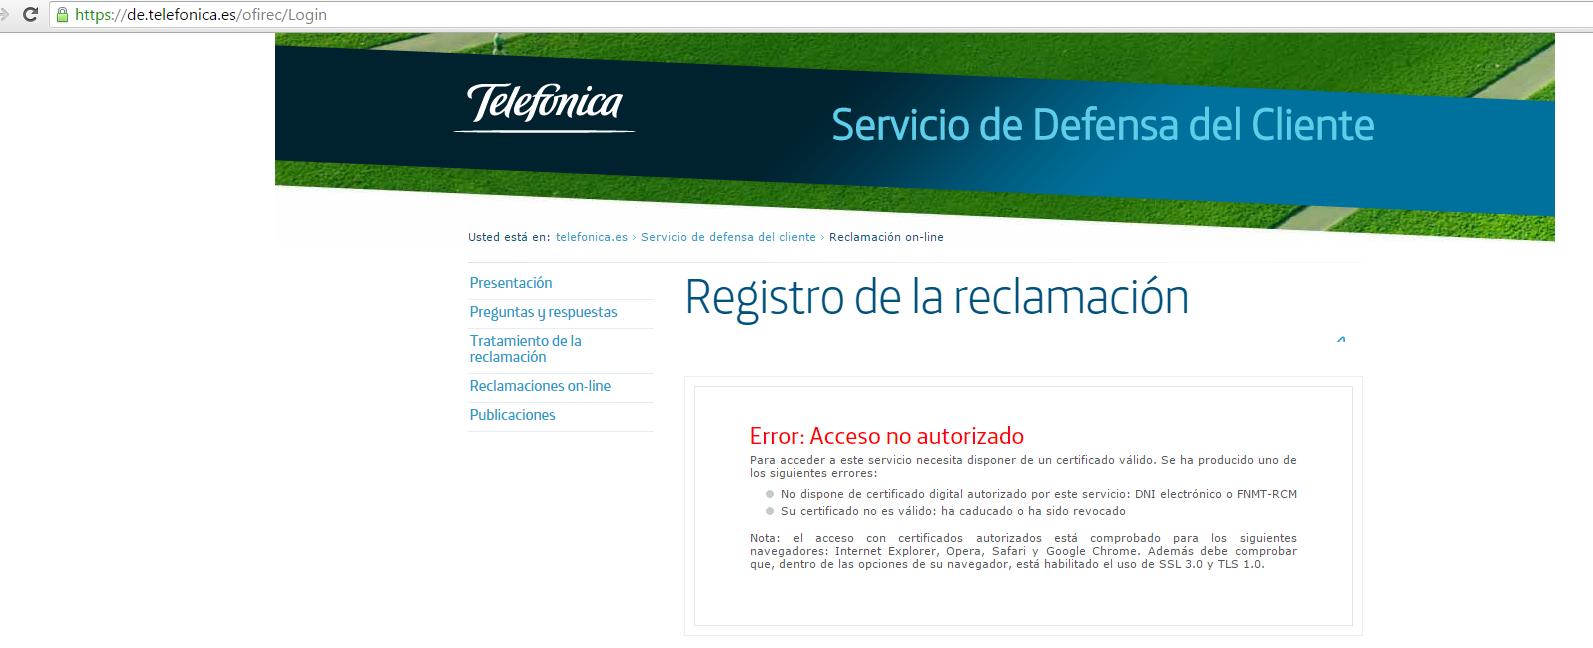 error_SDC_mismomensaje_ie_ffox_chrome_safari_opera_etc_etc.PNG